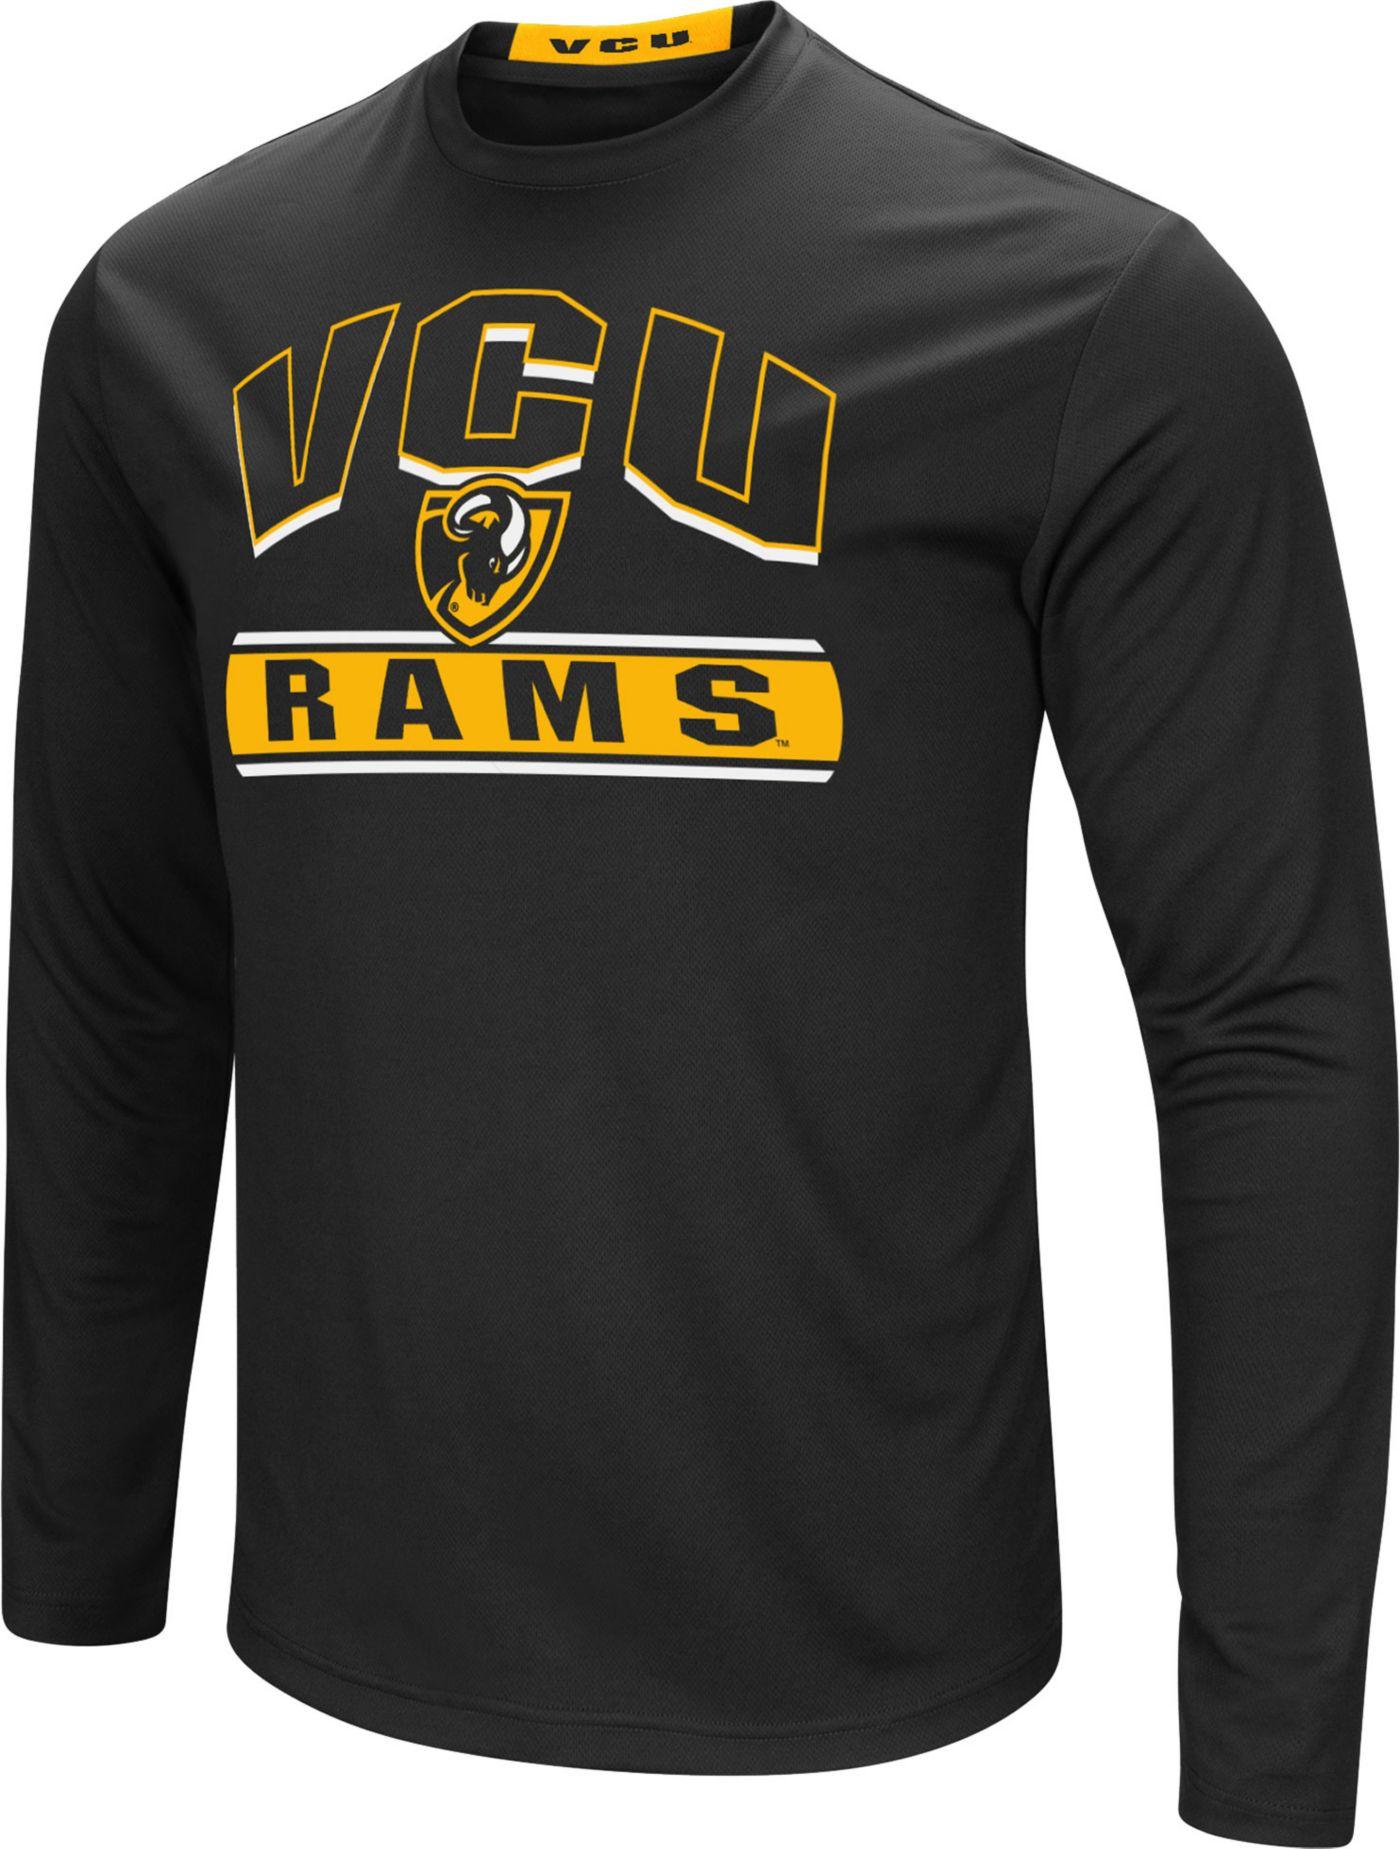 Colosseum Men's VCU Rams Ganges Long Sleeve Black T-Shirt